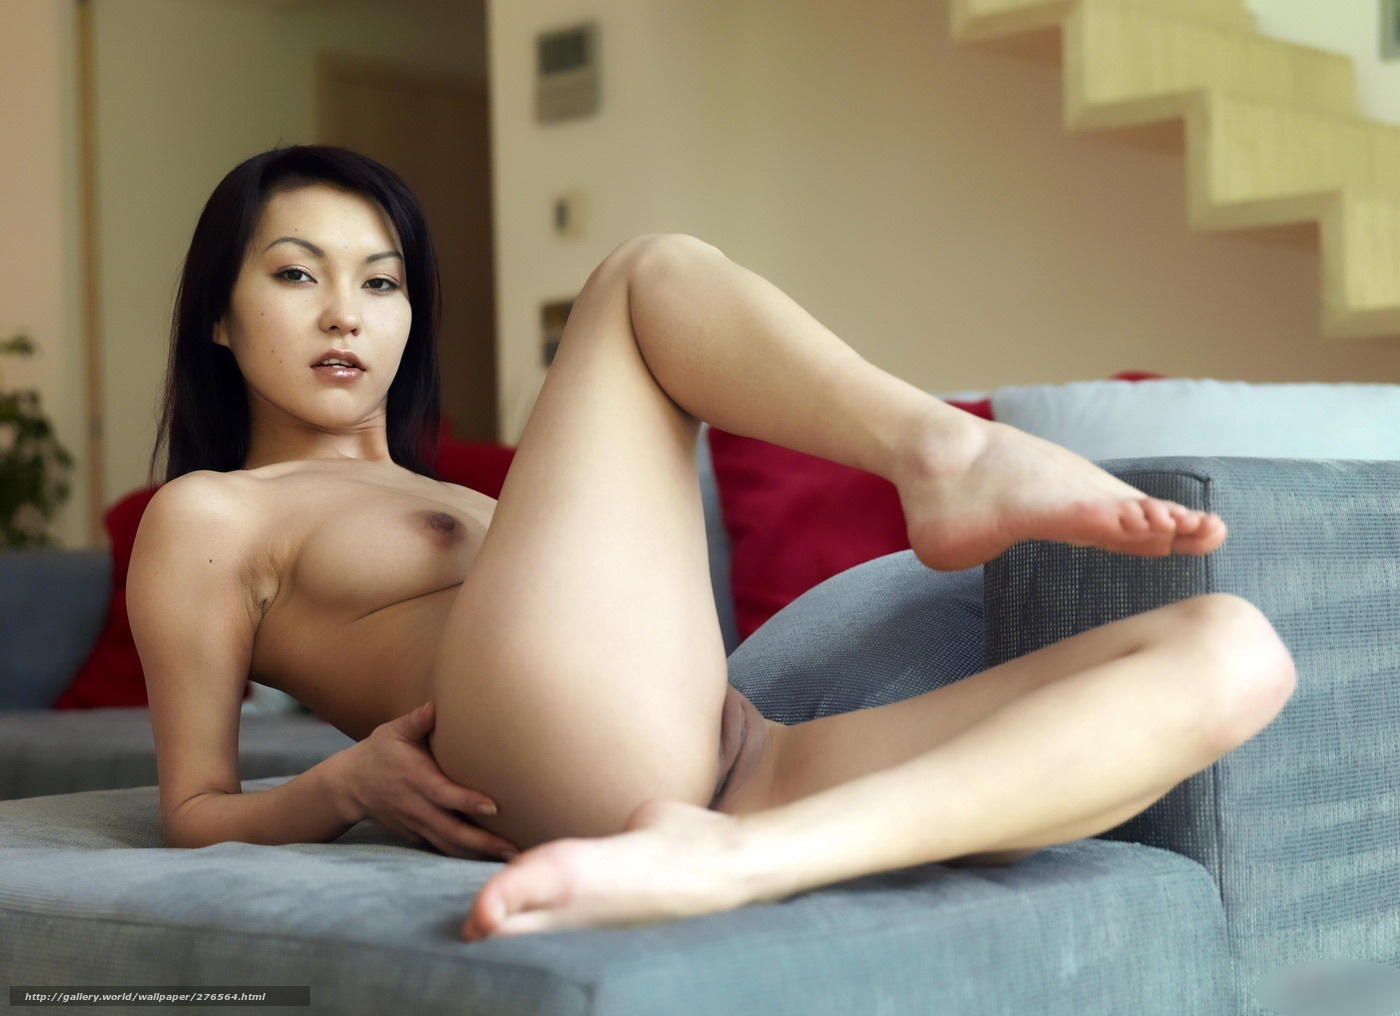 Секс фота казакские девушки 2 фотография